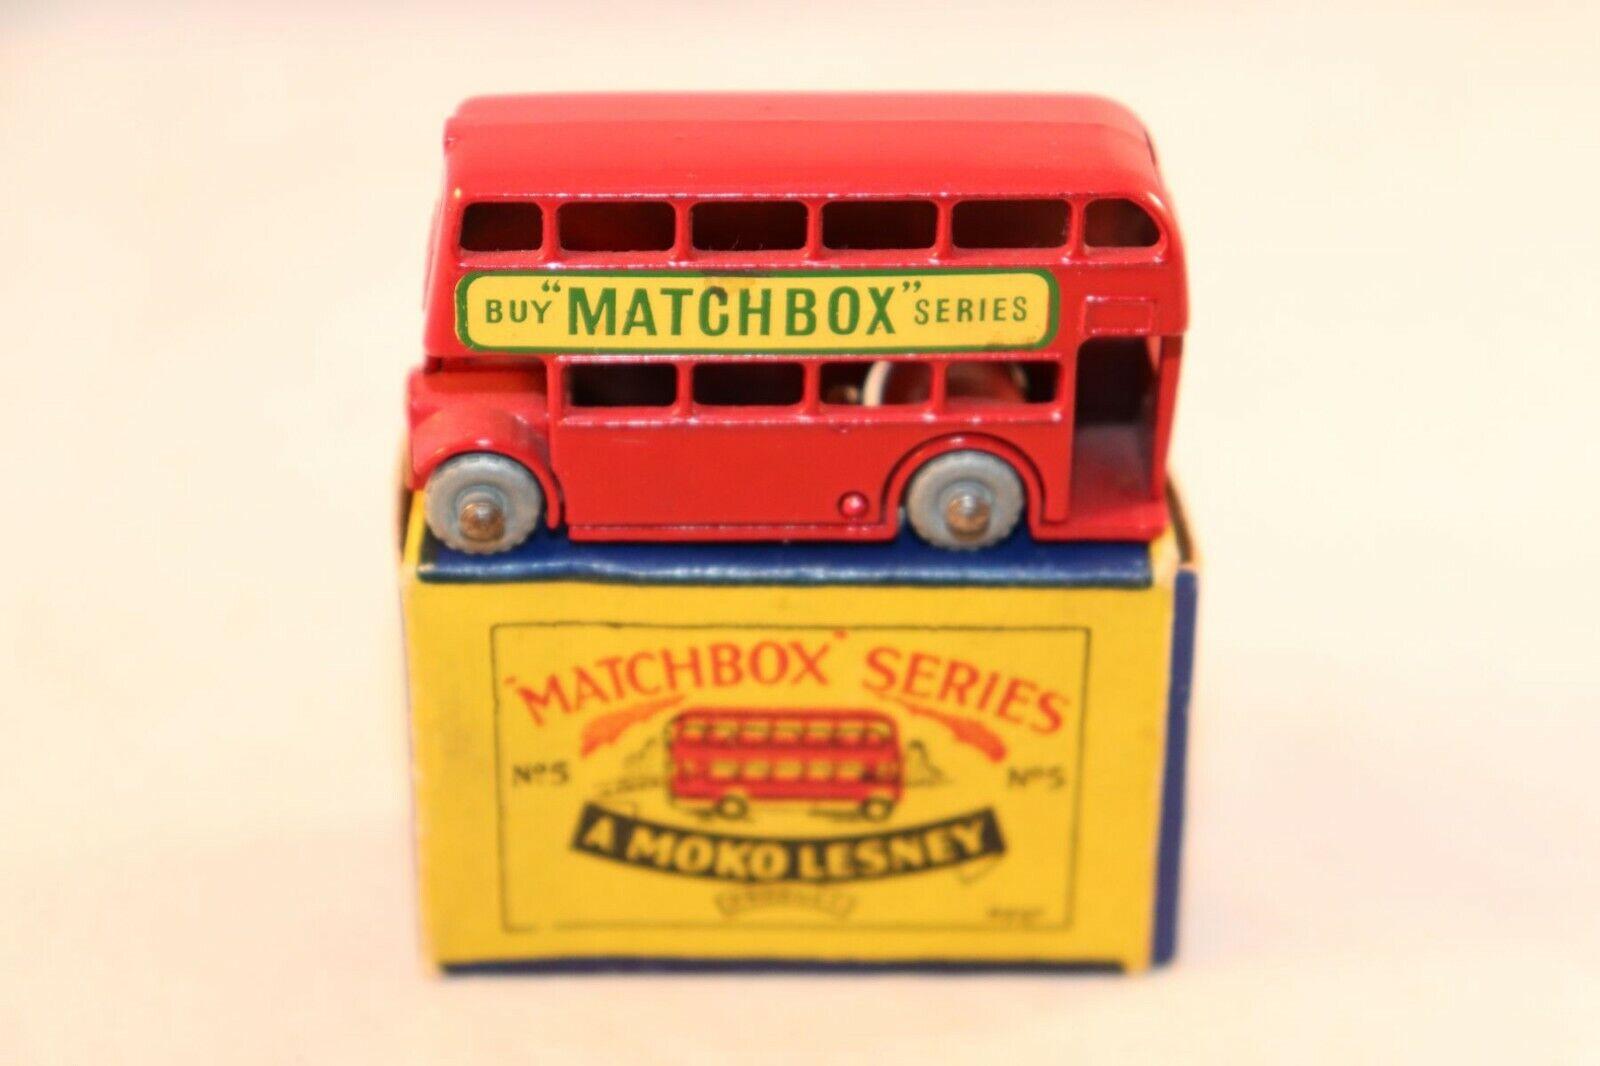 Matchbox Lesney No 5 London bus Buy Matchbox series mint in box GMW all original